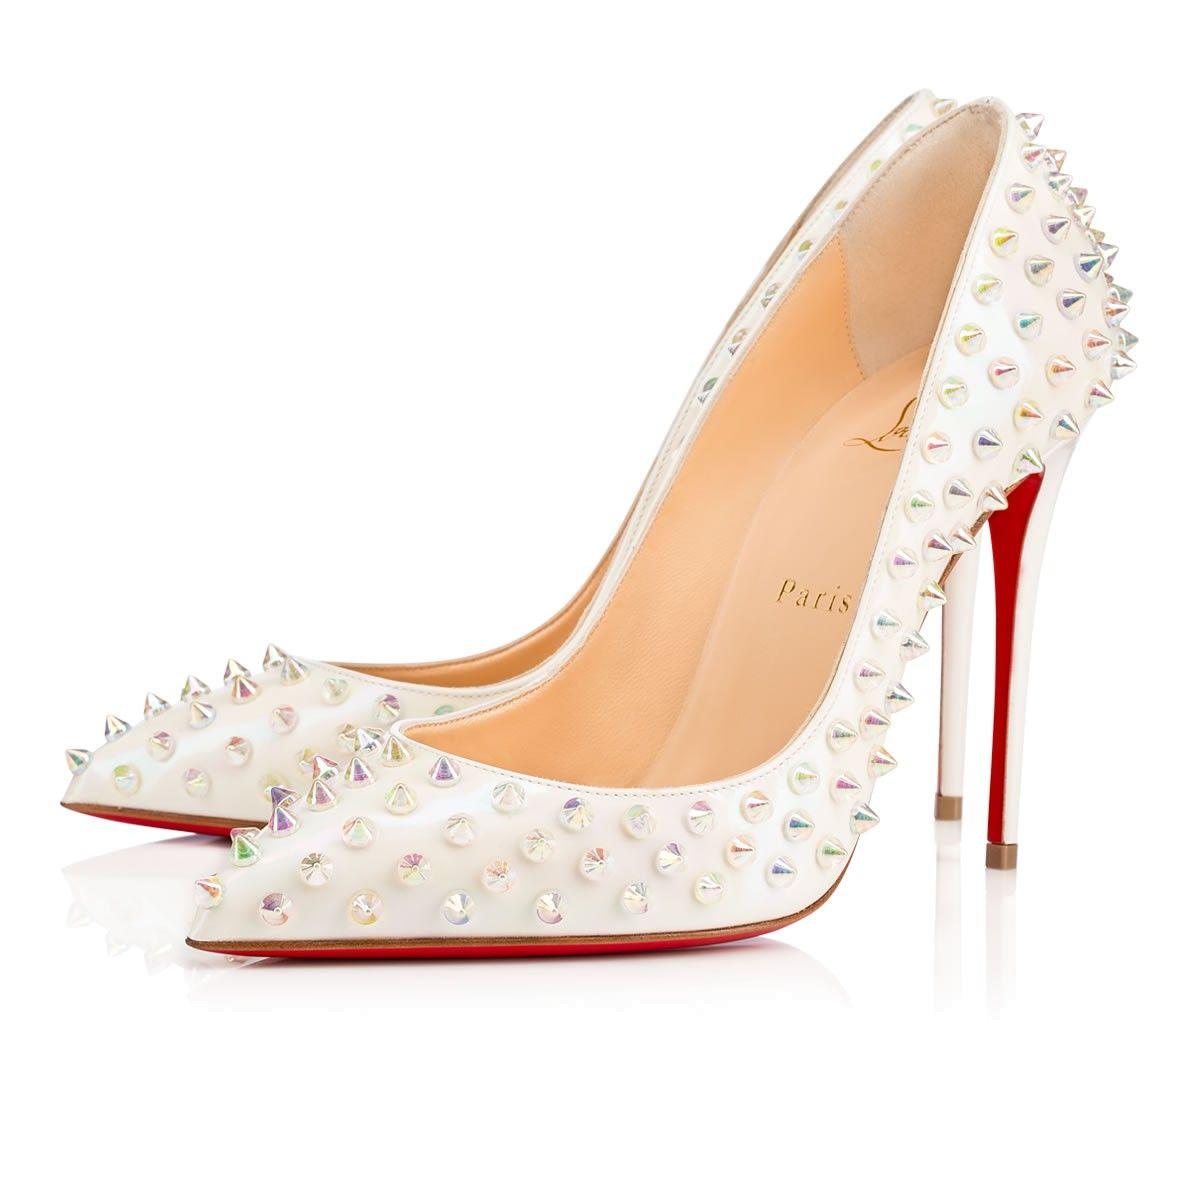 77a7b1137da Follies Spikes 100 White Aurora Boreale Clear Aurora Boreale Patent Aurora  Boreale - Women Shoes - Christian Louboutin